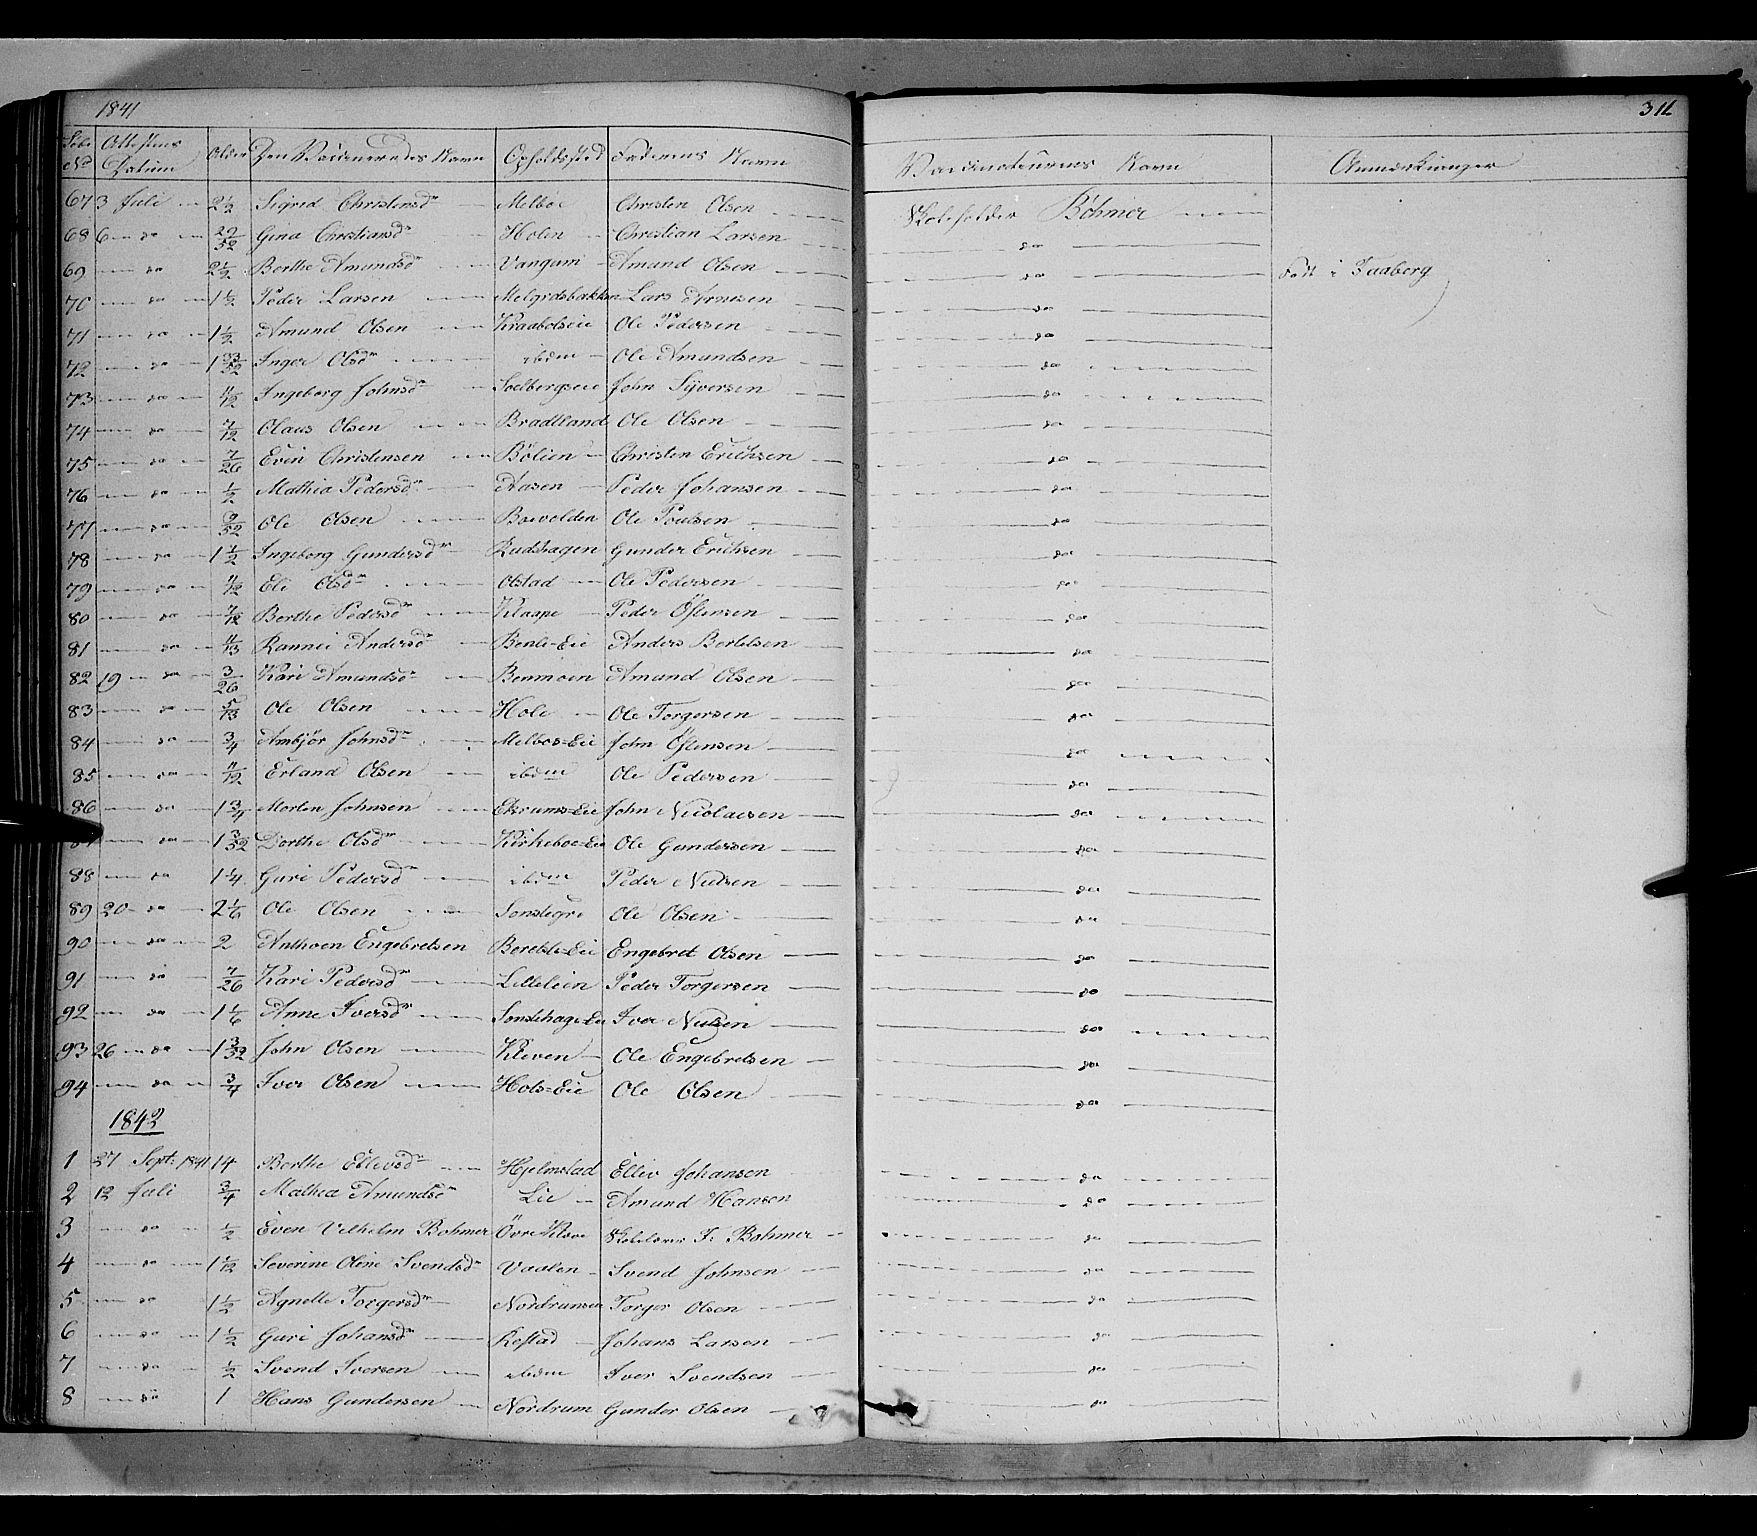 SAH, Gausdal prestekontor, Ministerialbok nr. 7, 1840-1850, s. 311